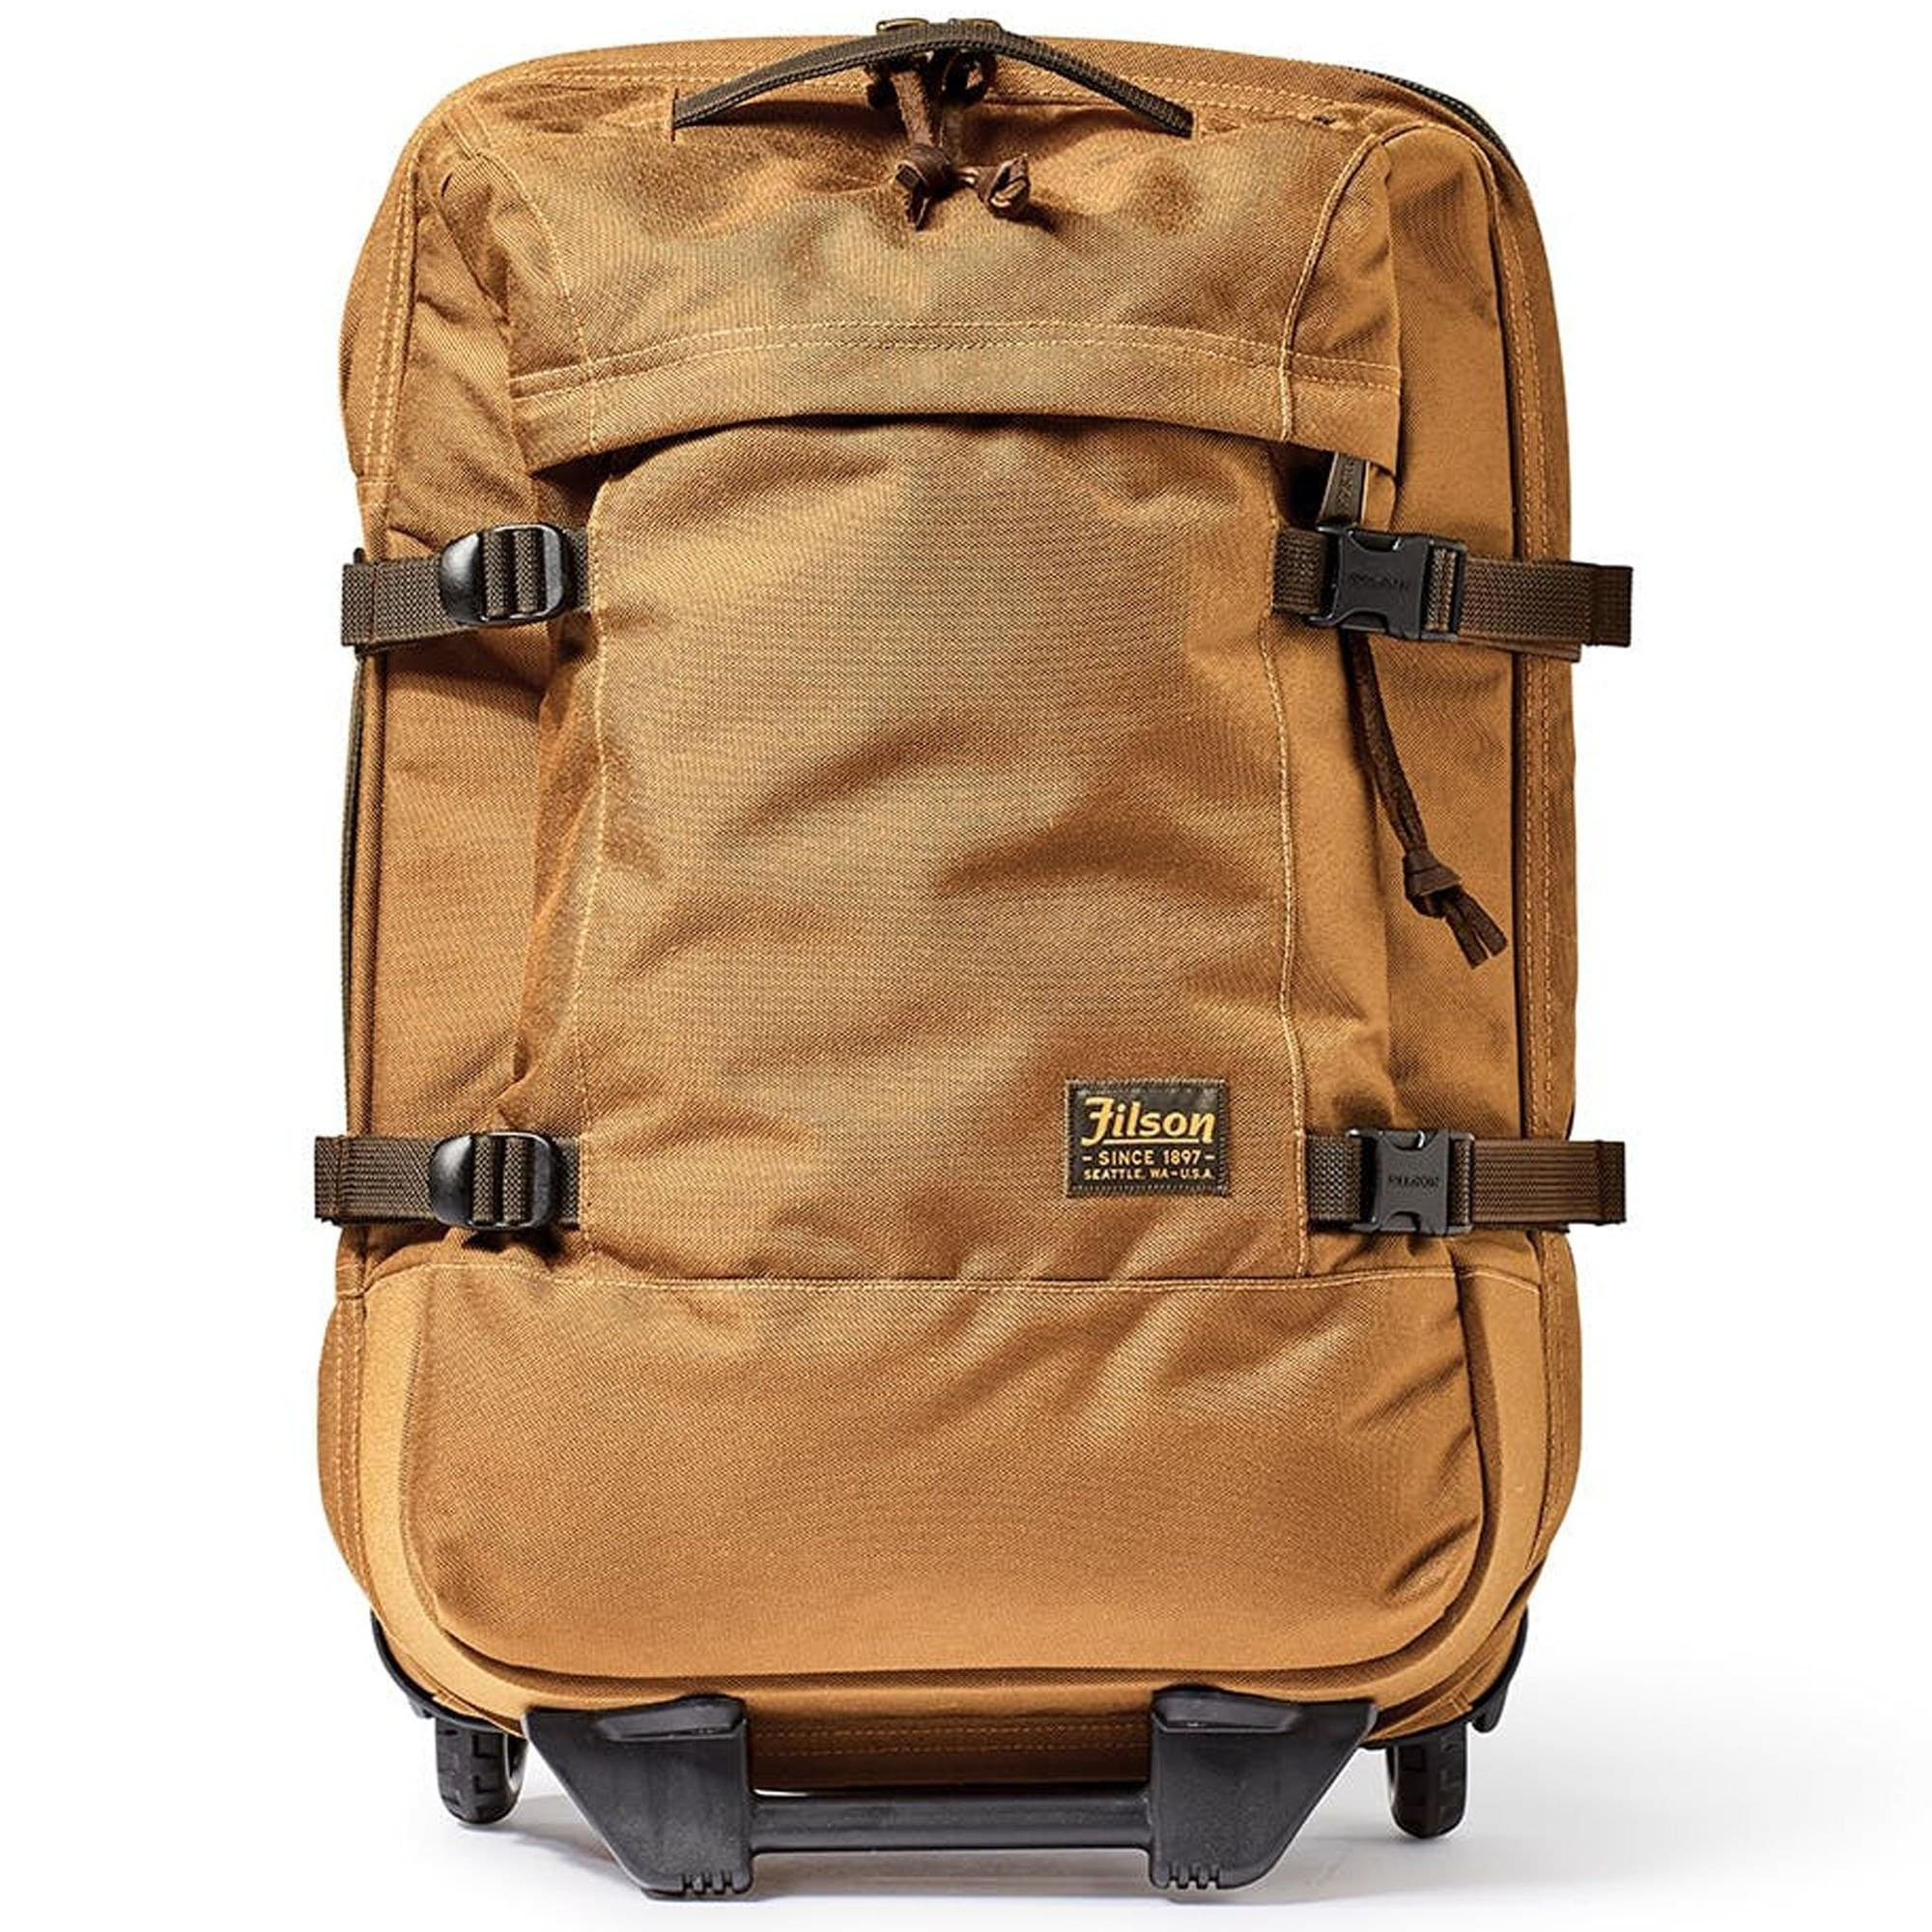 0a12179227 Filson Ballistic Nylon Dryden Carry On Suitcase